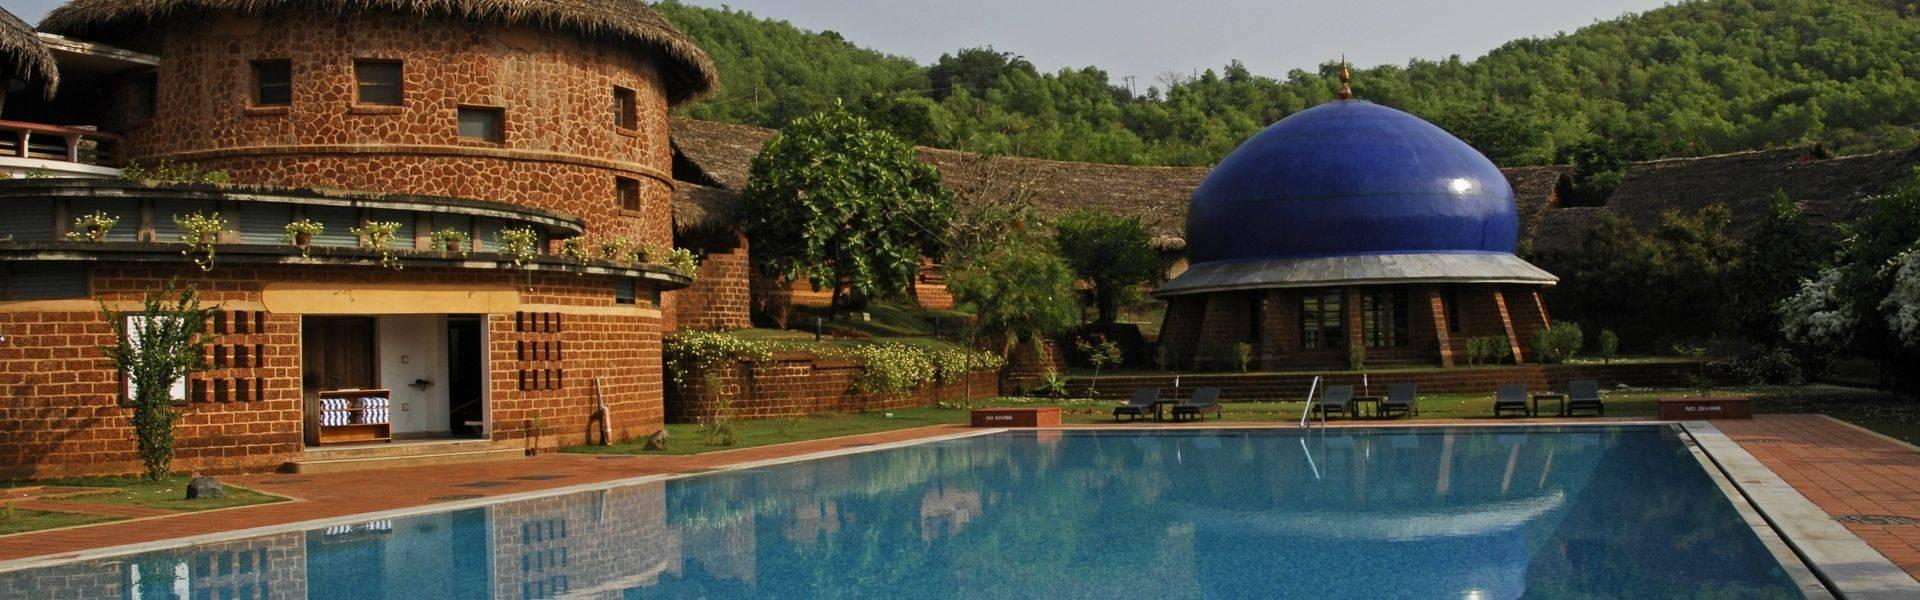 SwaSwara-pool.JPG